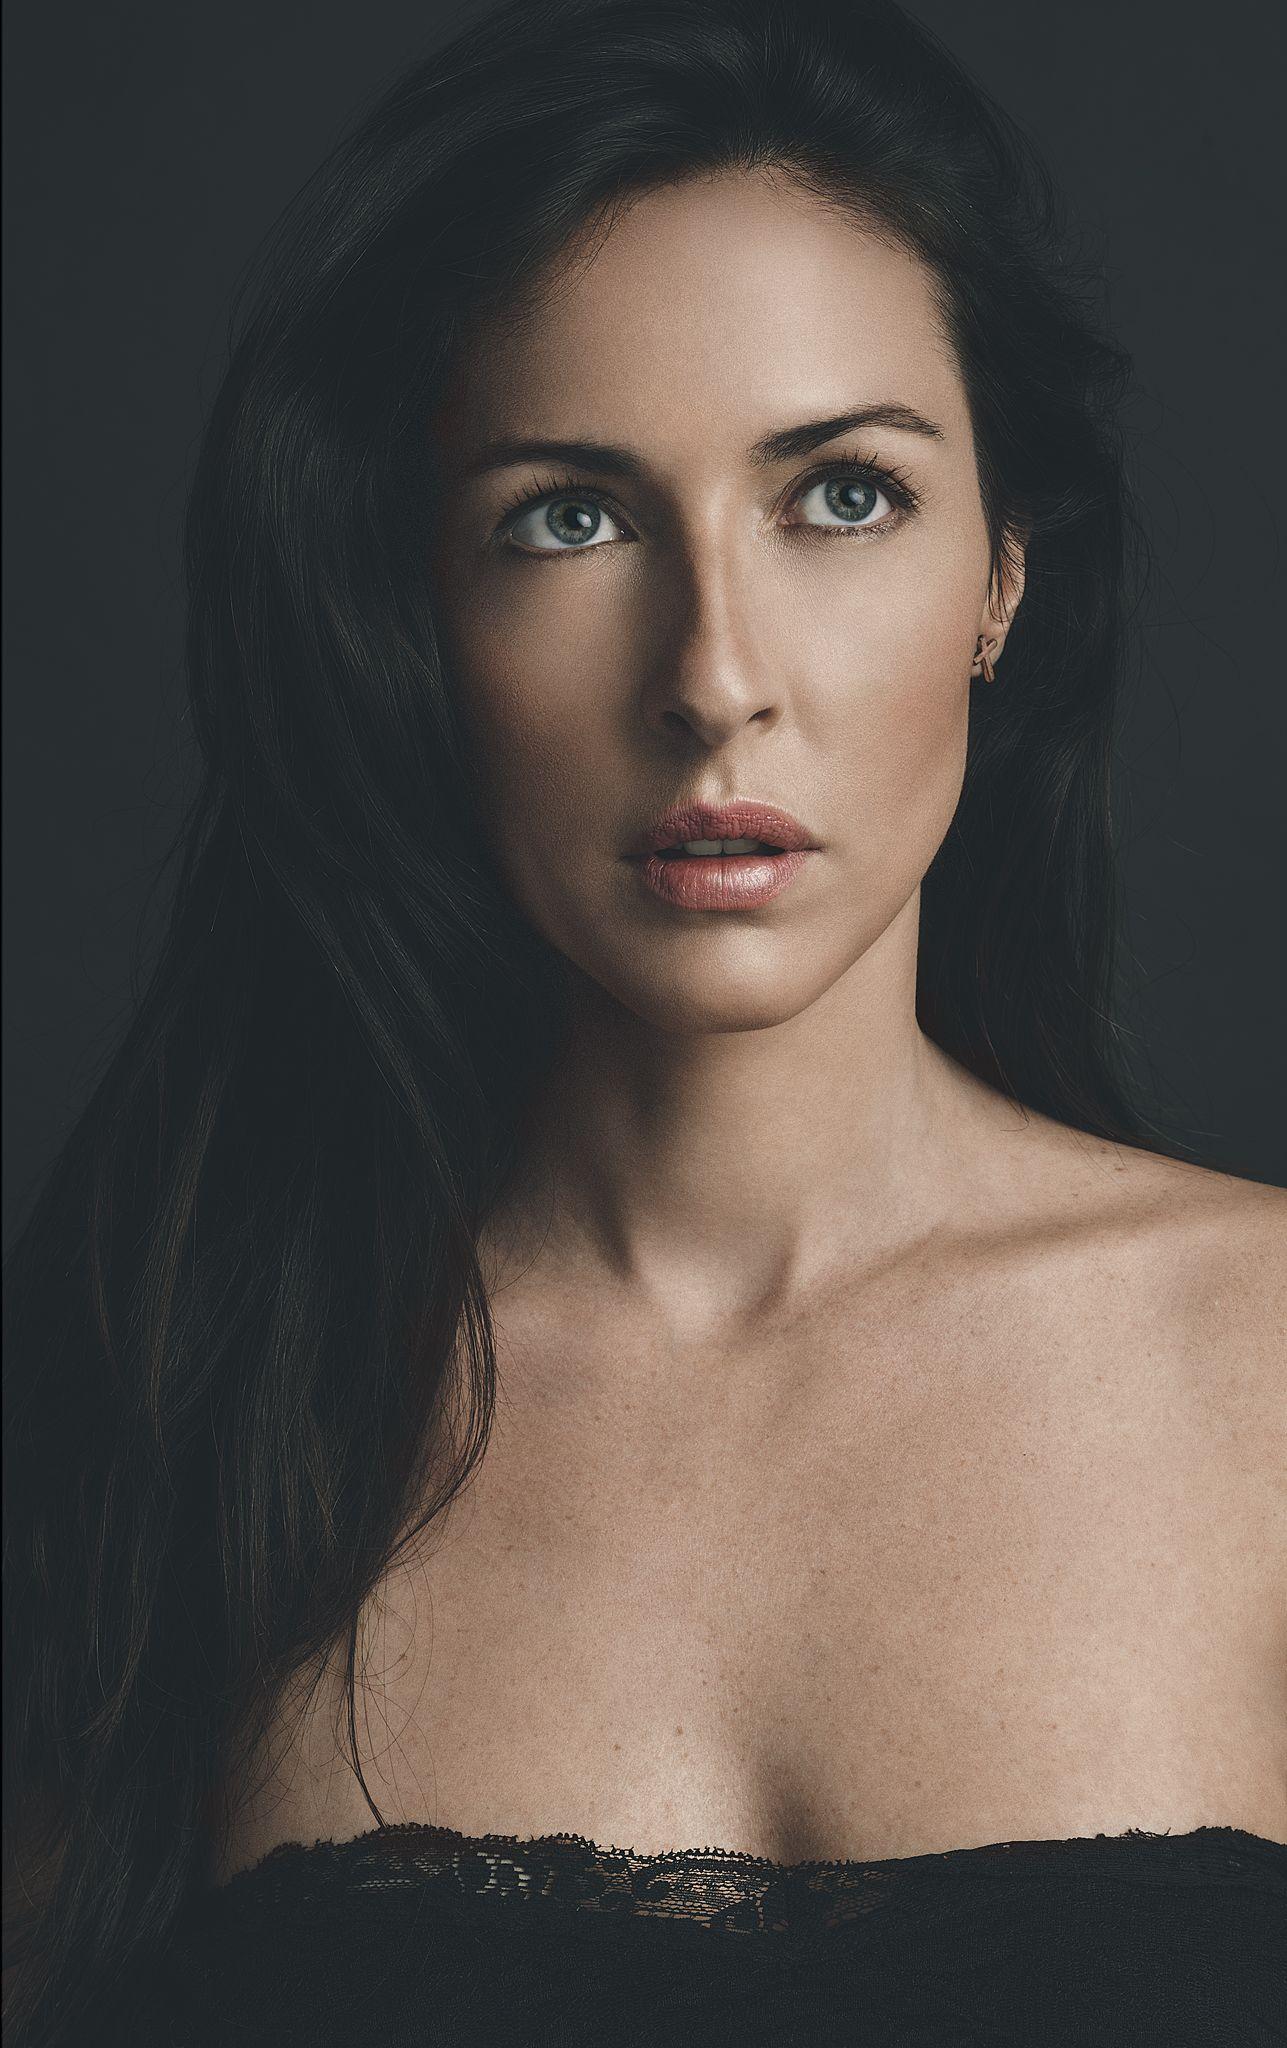 Agustina Iturraspe Nude Photos 34